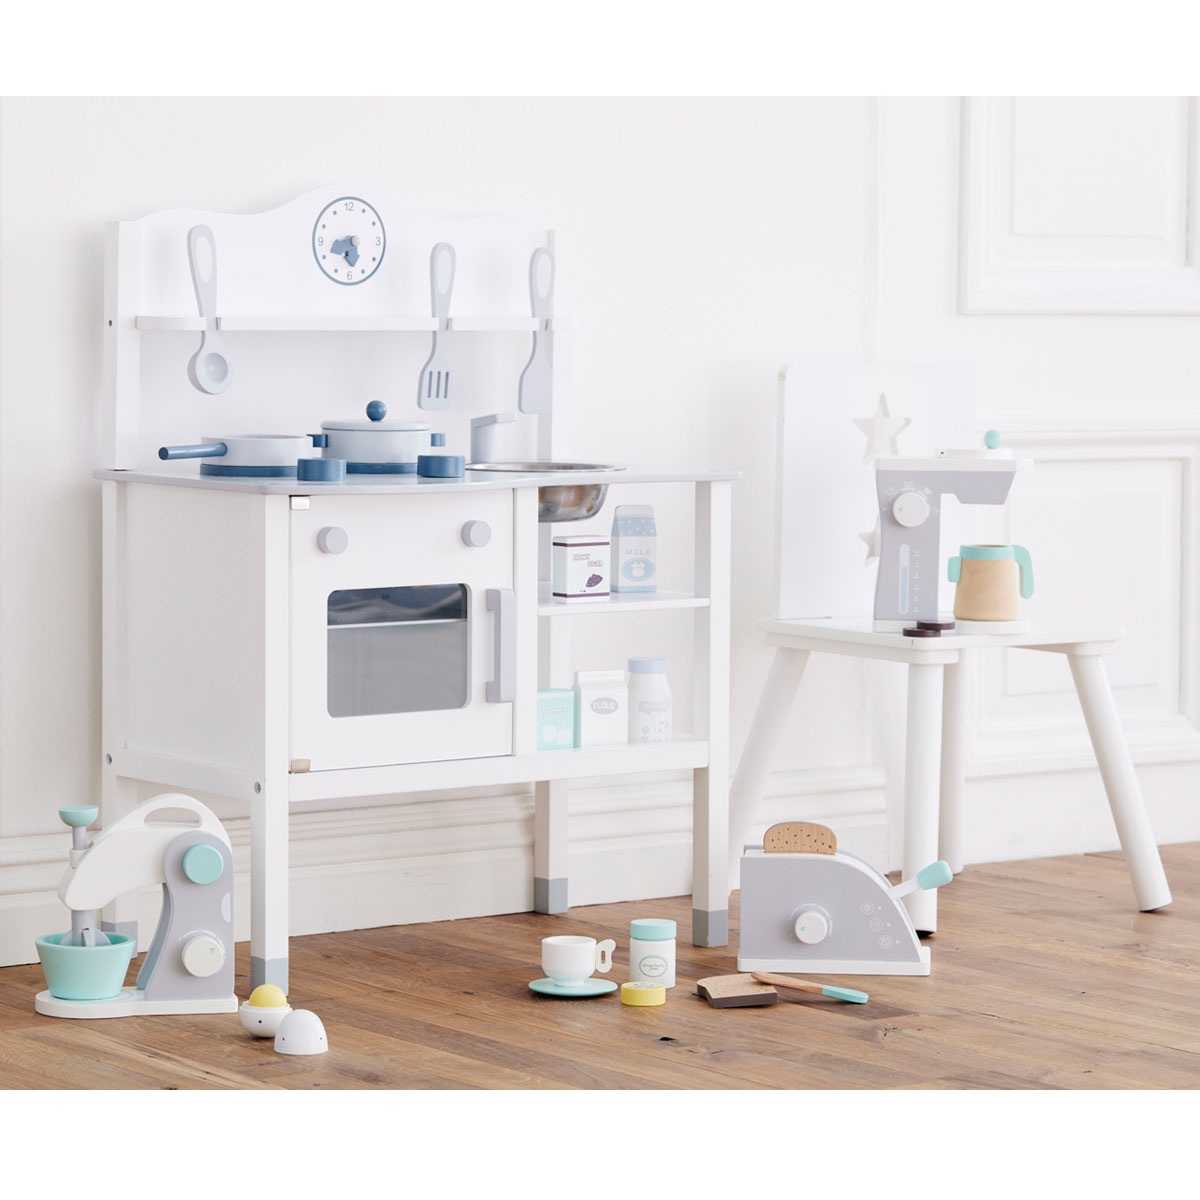 kids concept kaffeemaschine wei grau f r diei kinderk che aus holz. Black Bedroom Furniture Sets. Home Design Ideas